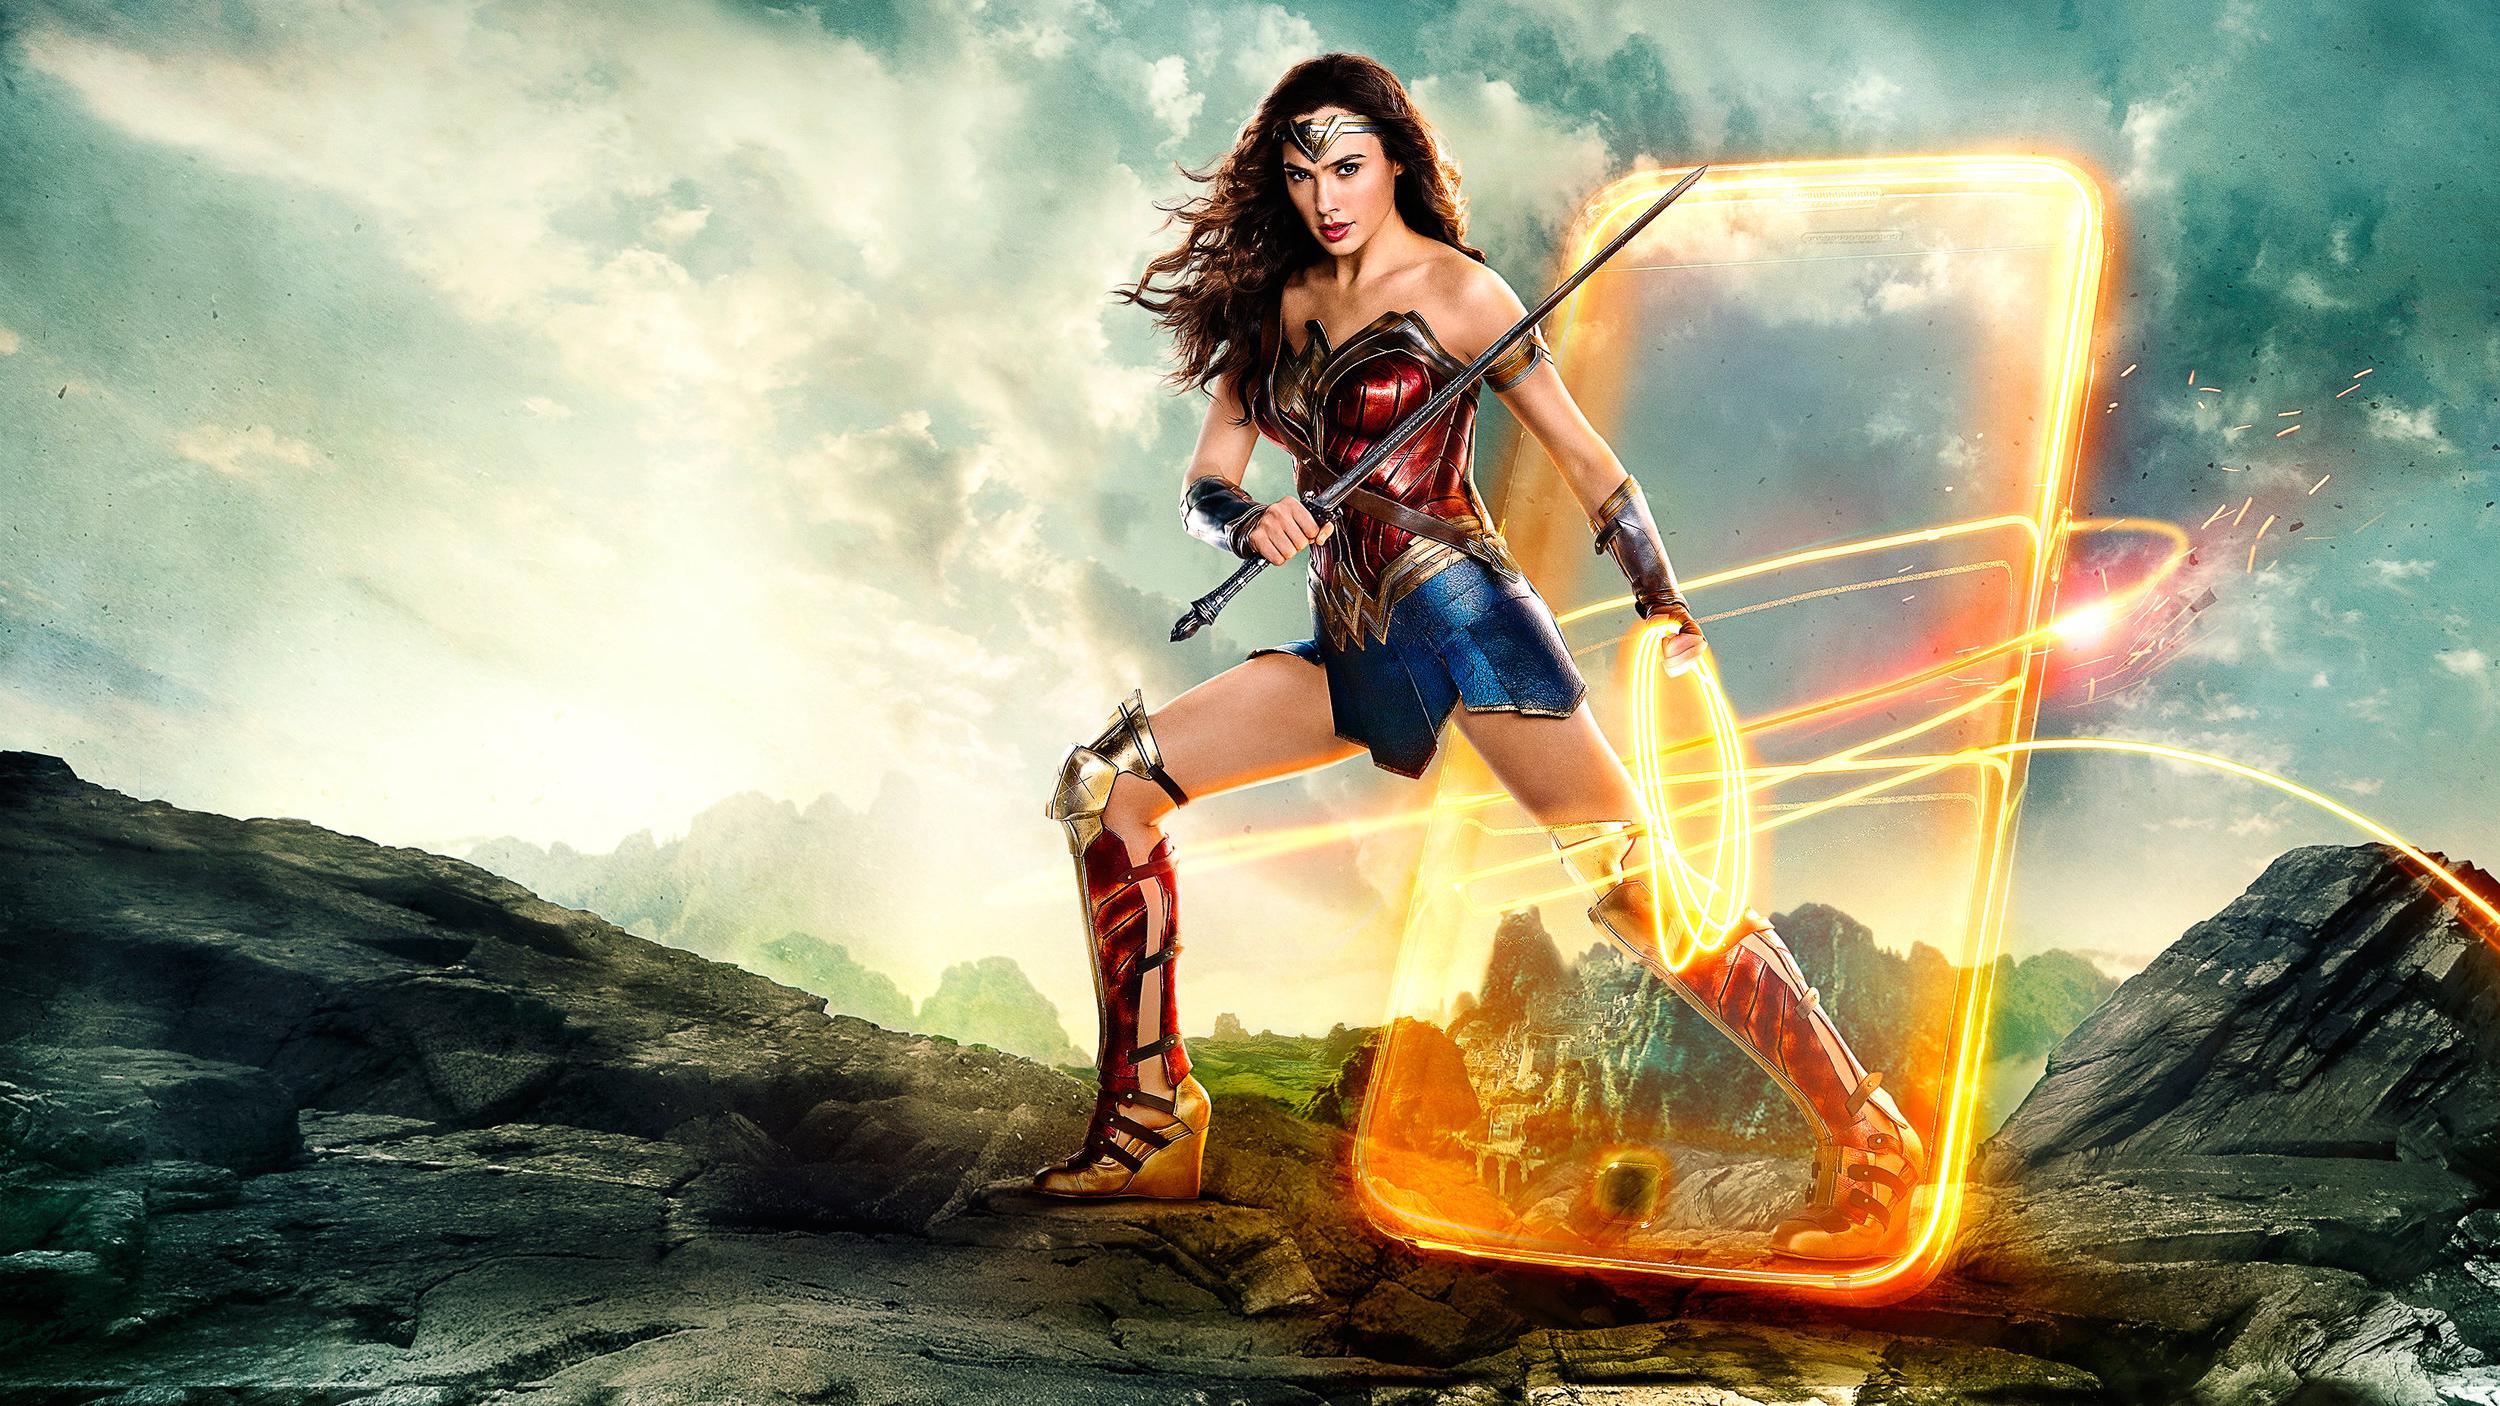 Wonder Woman Movie Wallpaper 1: Justice League Wonder Woman 2018, HD Movies, 4k Wallpapers